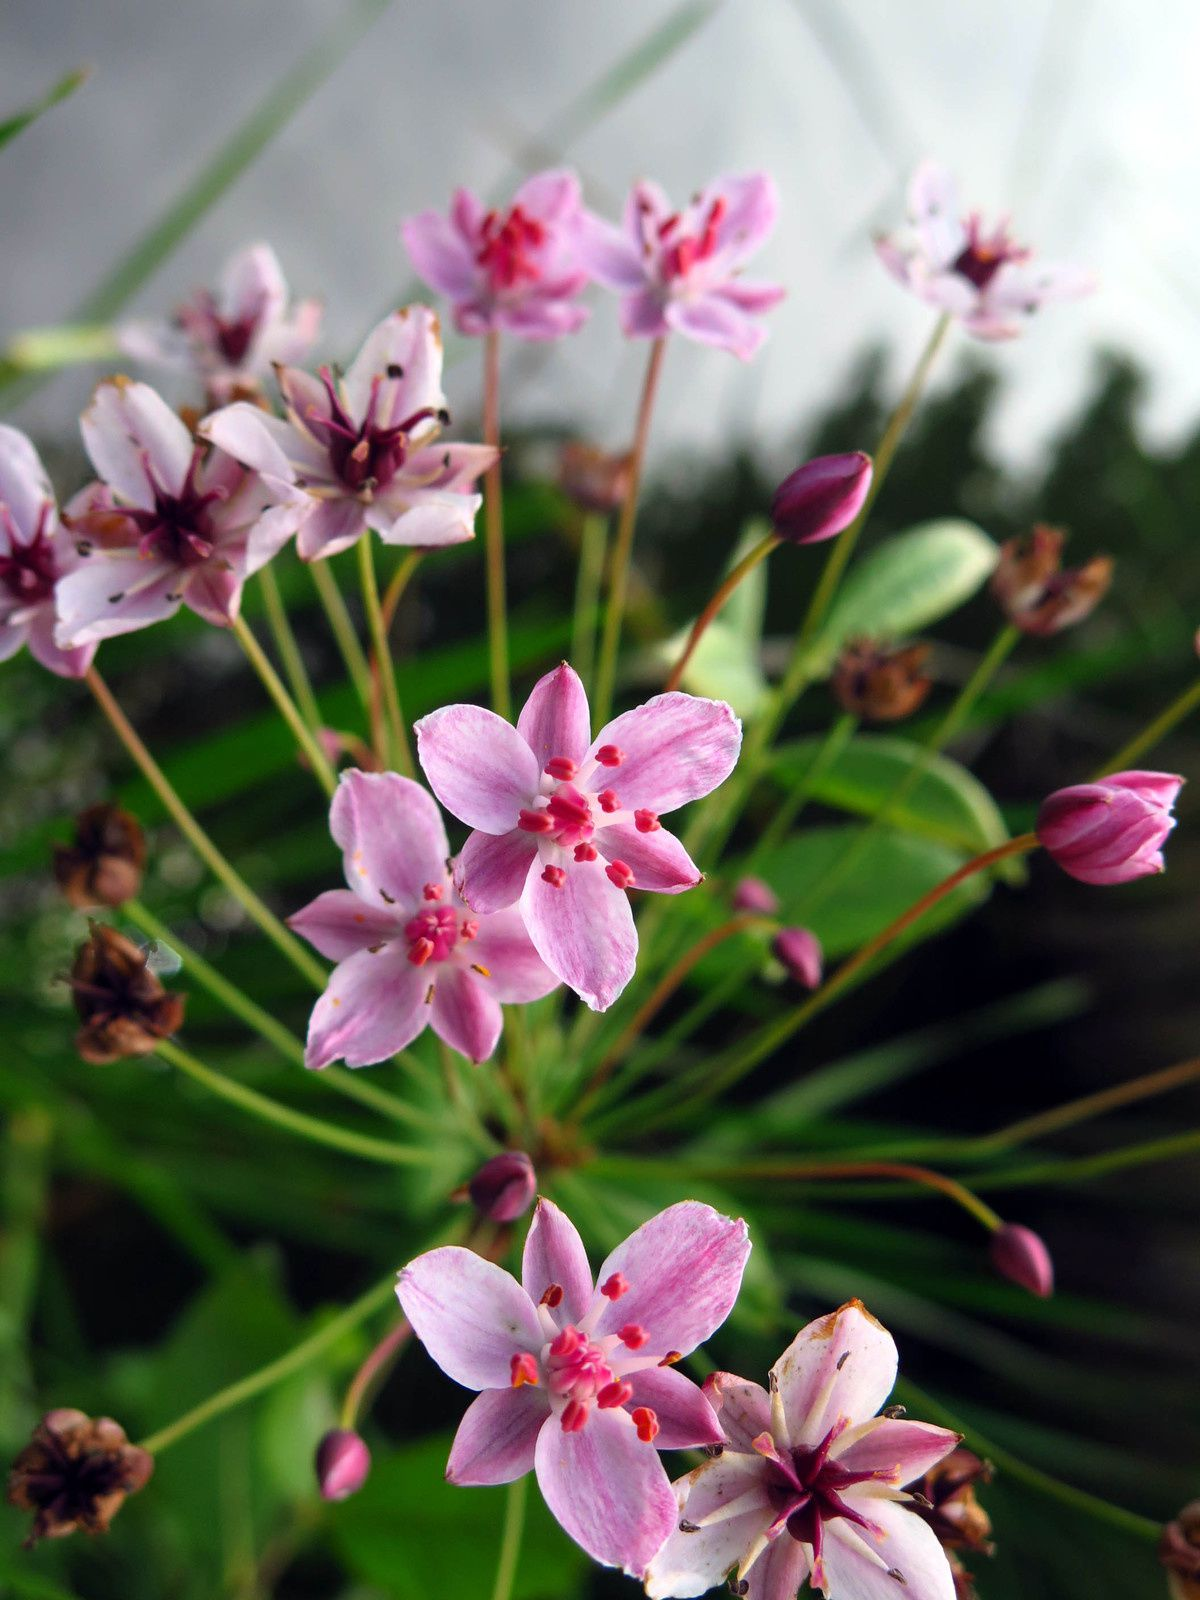 Jonc fleuri ou Butome à ombelle (Butomus umbellatus)